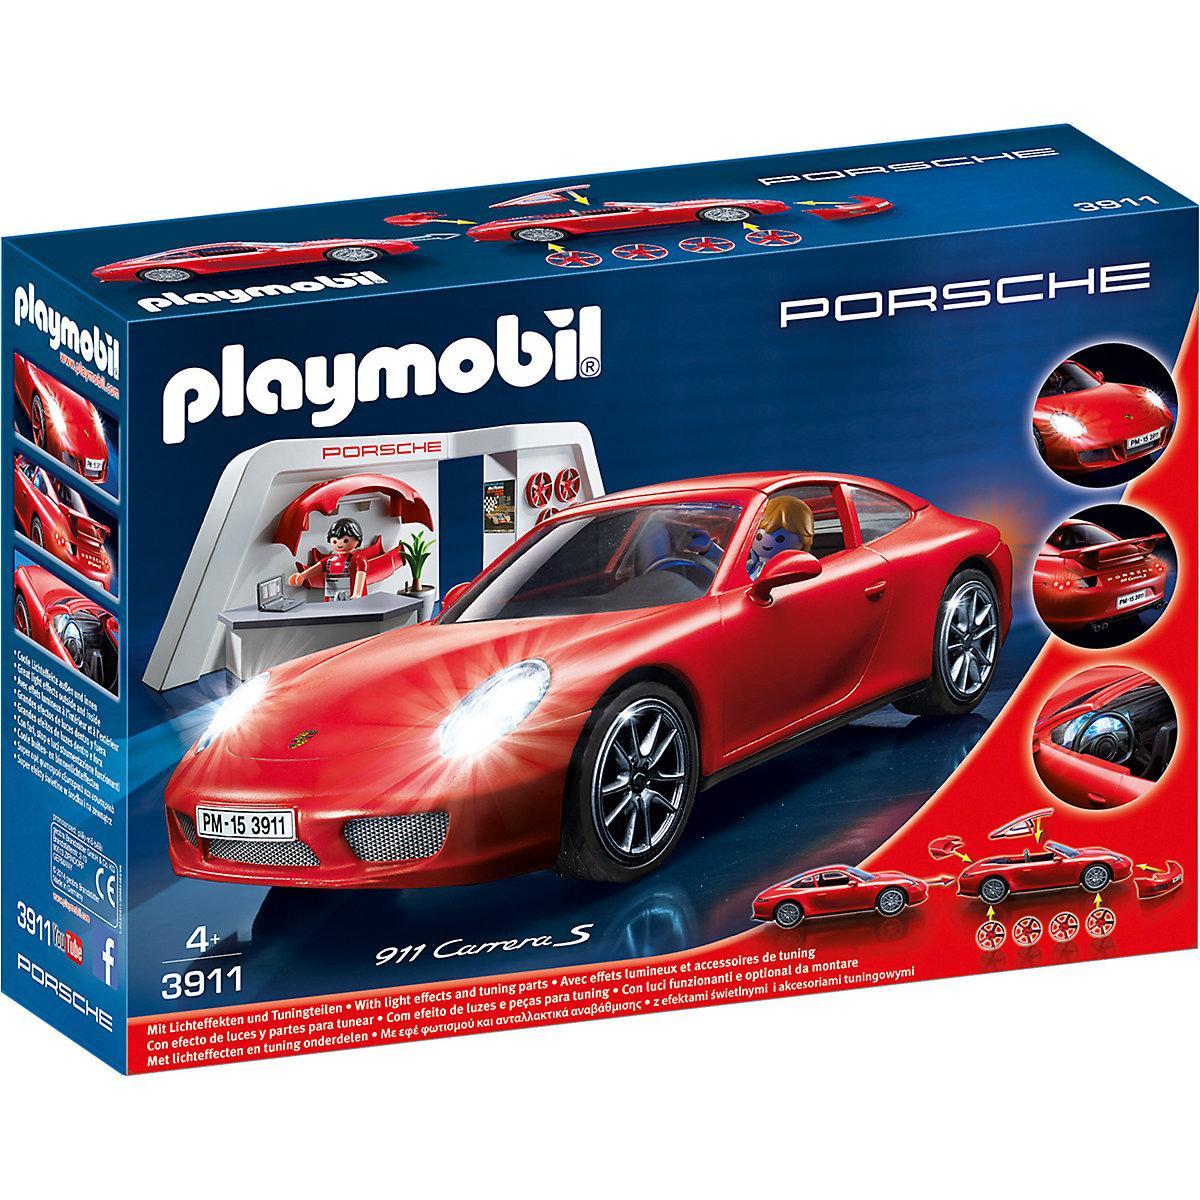 Jouet Playmobil - Porsche 911 Carrera S